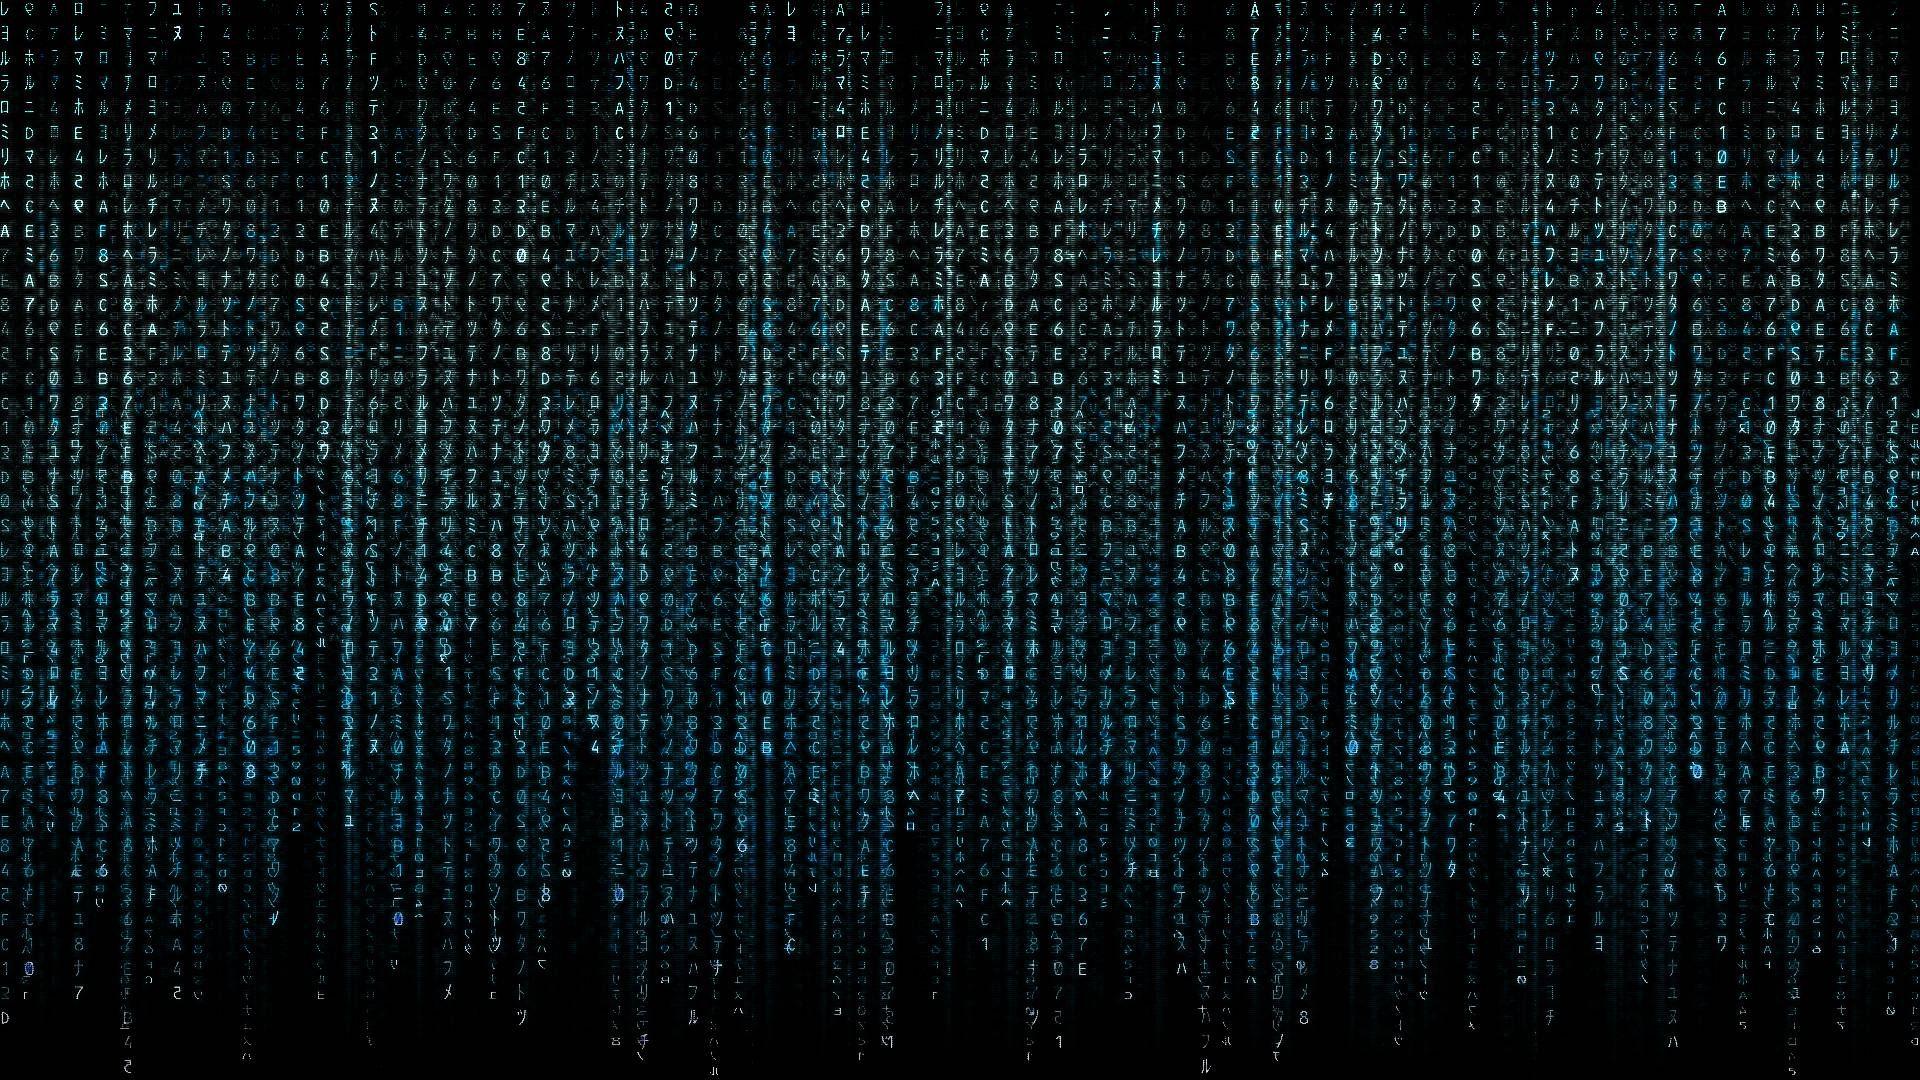 Coding wallpaper background